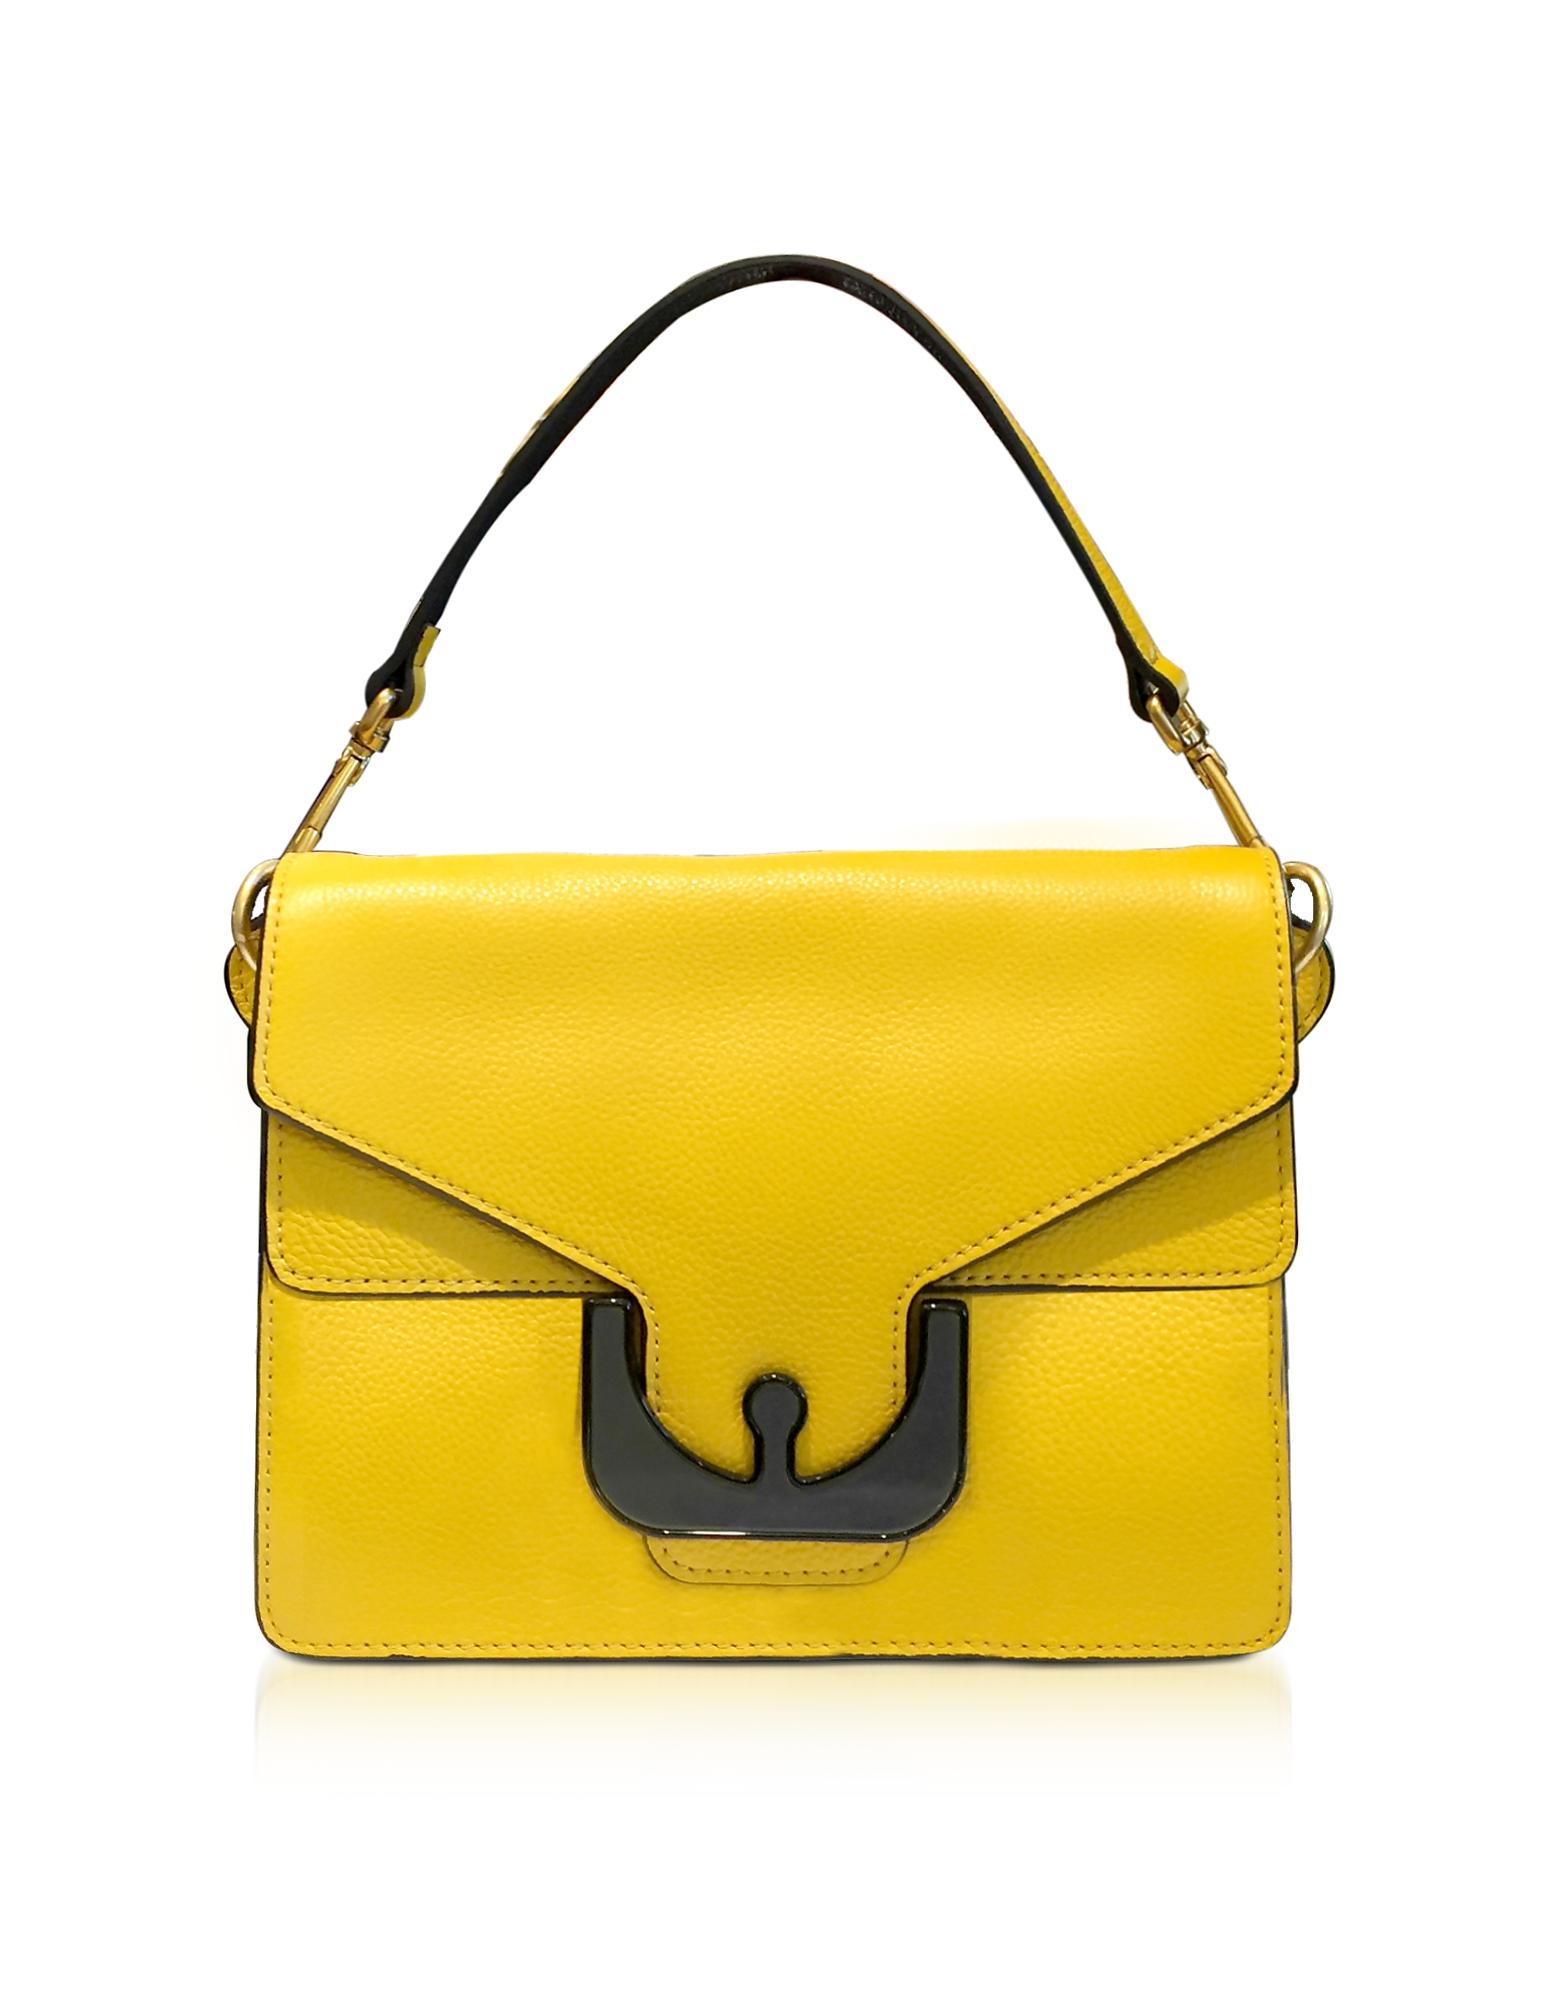 Coccinelle Handbags, Ambrine Graphic Sunflower Leather Satchel Bag